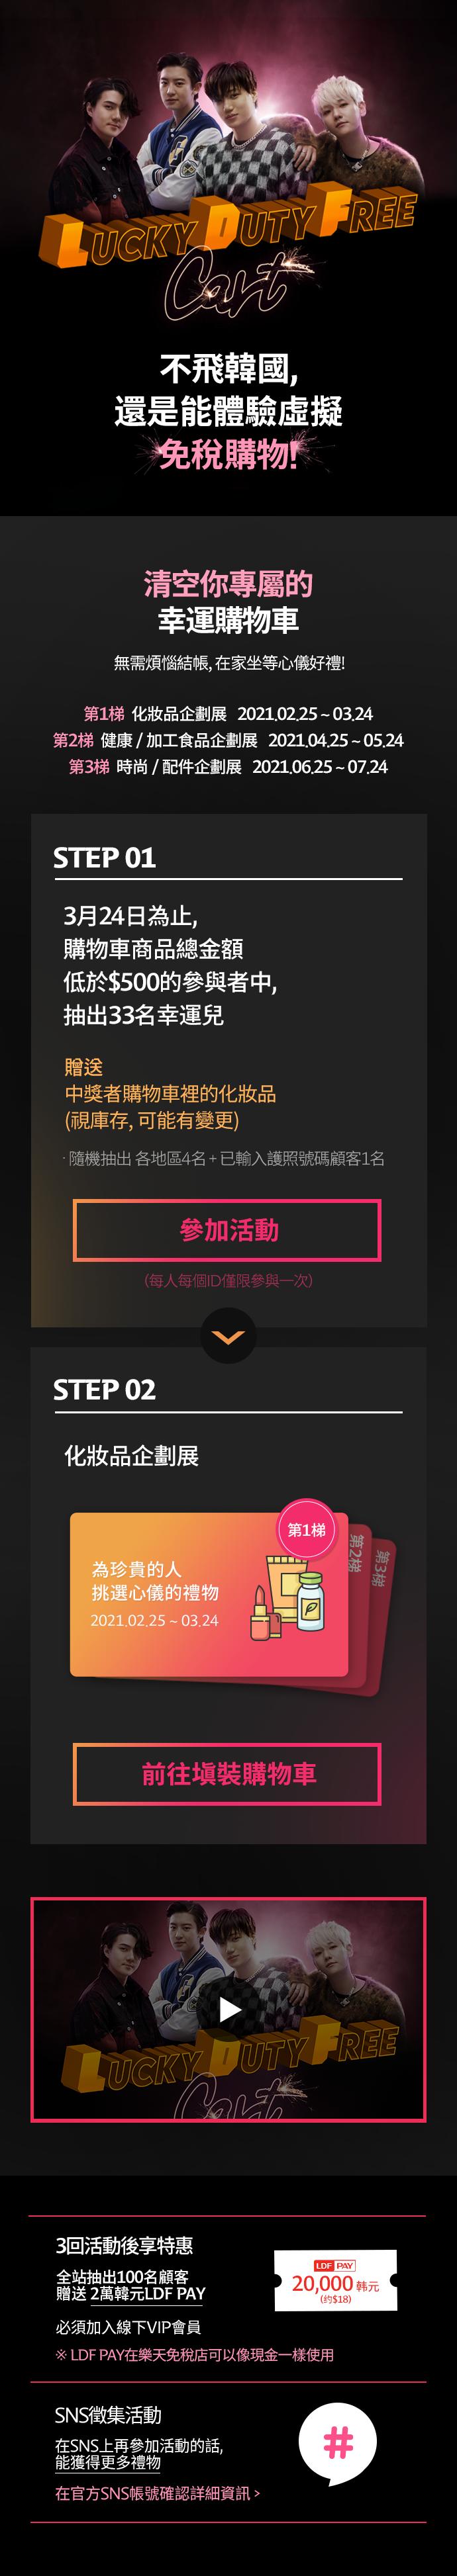 LUCKY DUTY FREE Cart 不飛韓國, 還是能體驗虛擬 免稅購物!